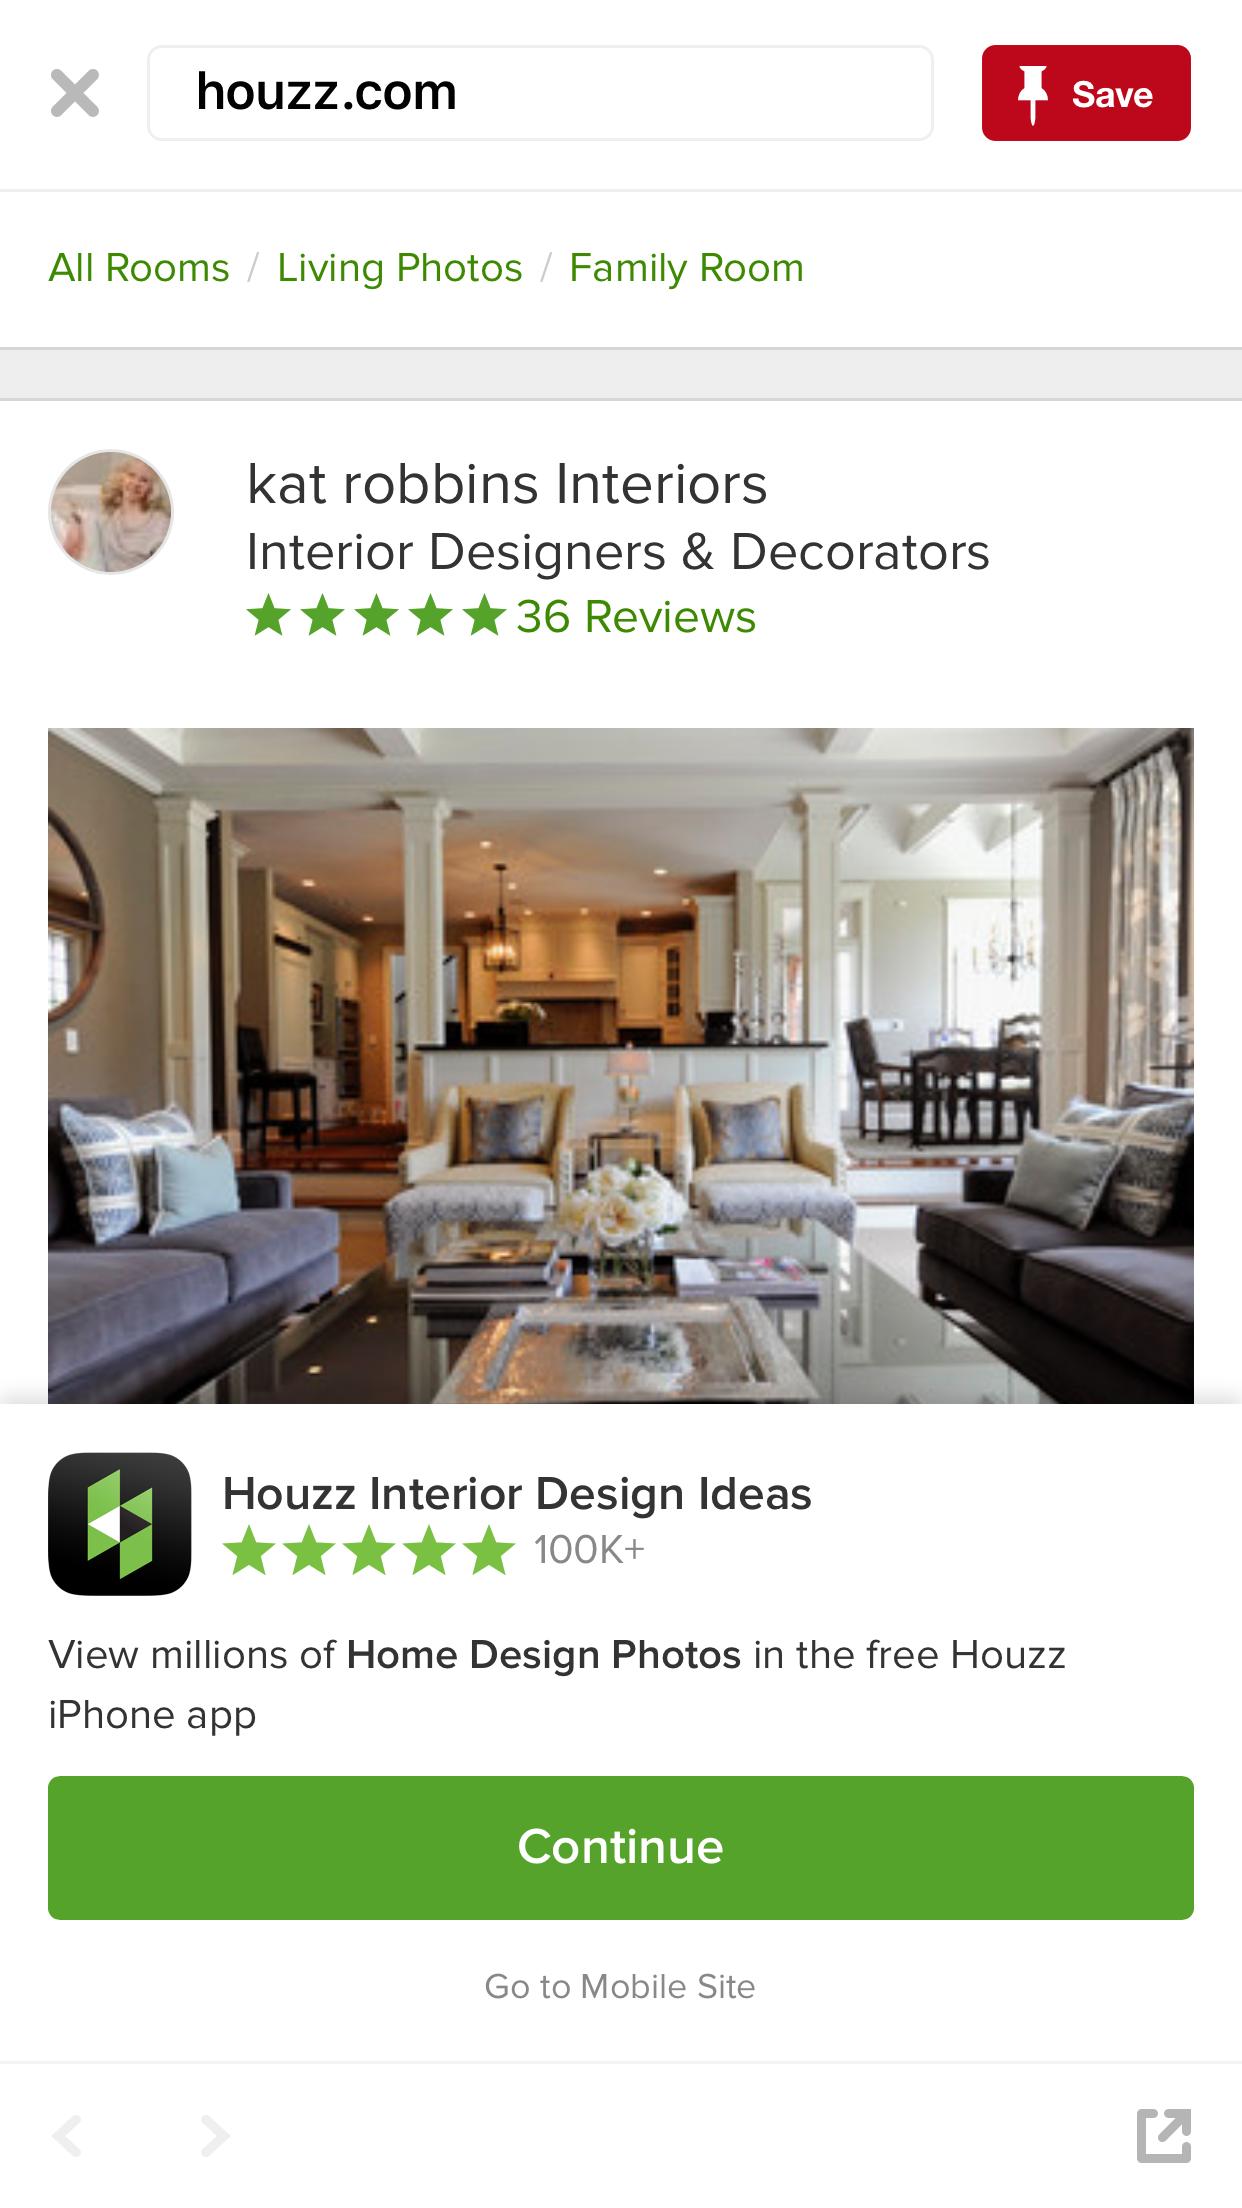 Houzz Furniture And Interior Design Ideas In 2020 Bathroom